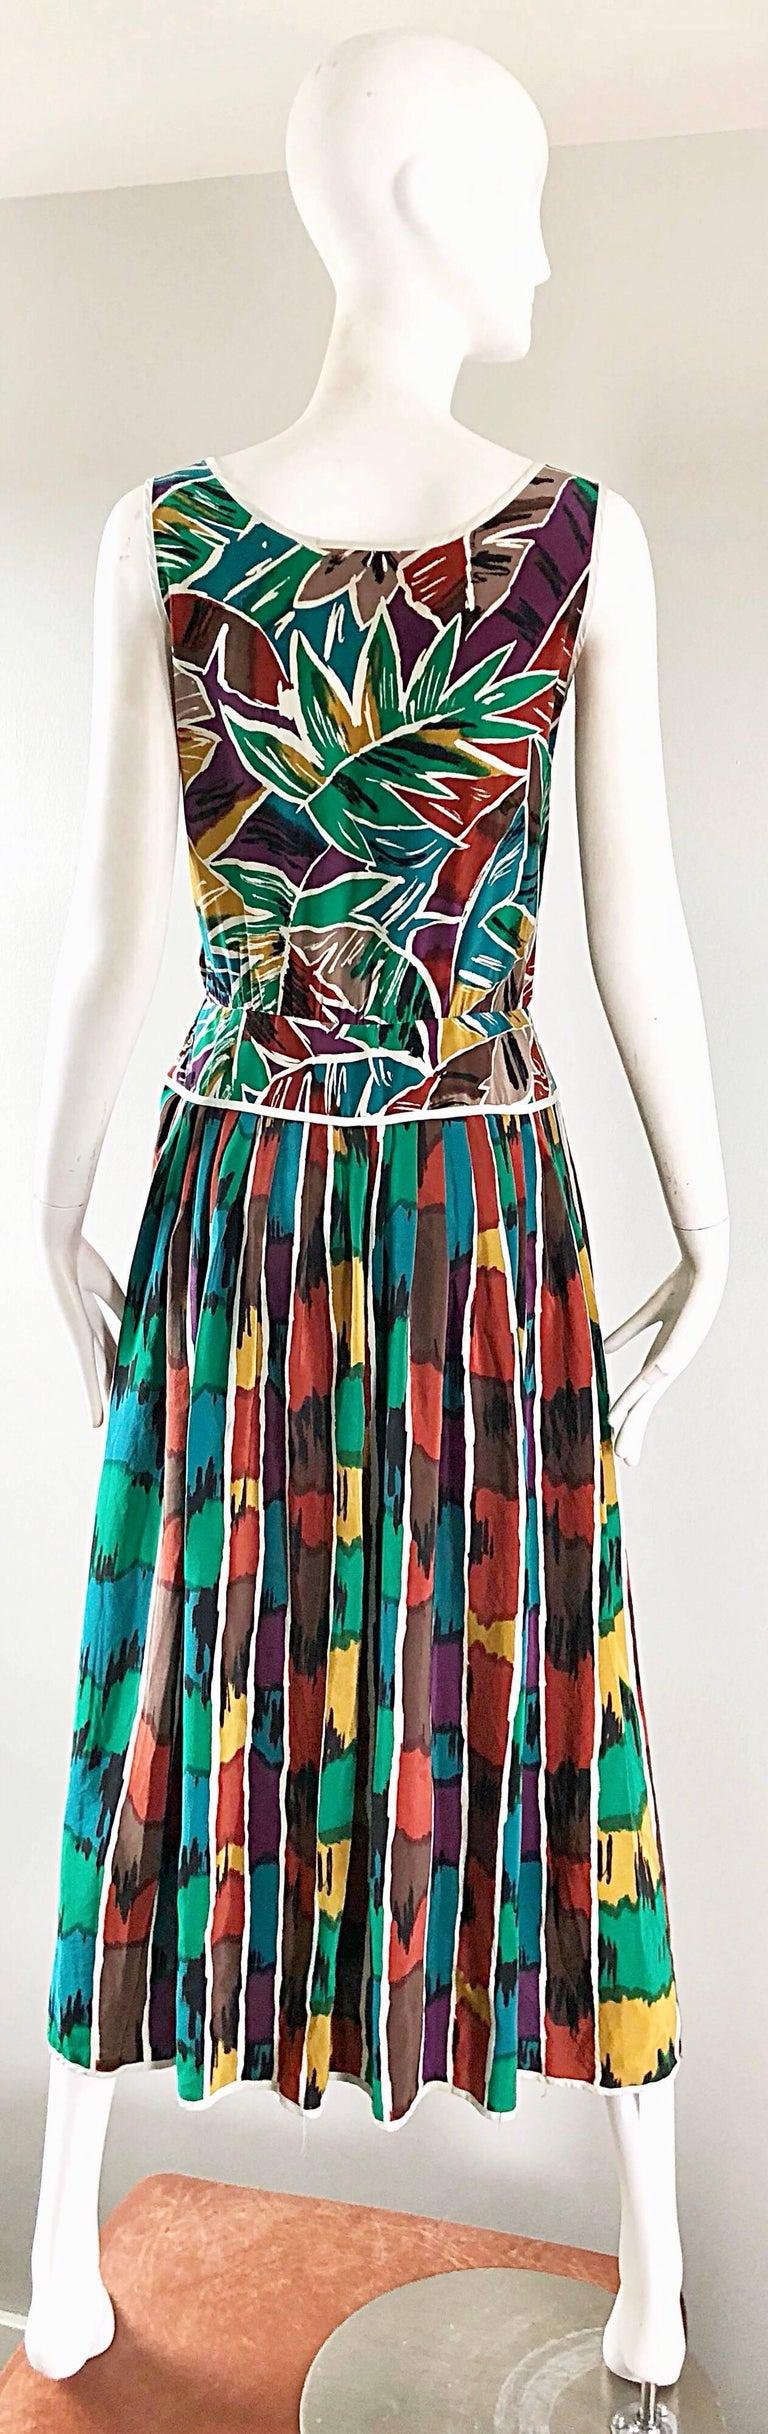 Vintage Oscar de la Renta Size 8 / 10 Kaleidoscope Print Silk Sleeveless Dress For Sale 10